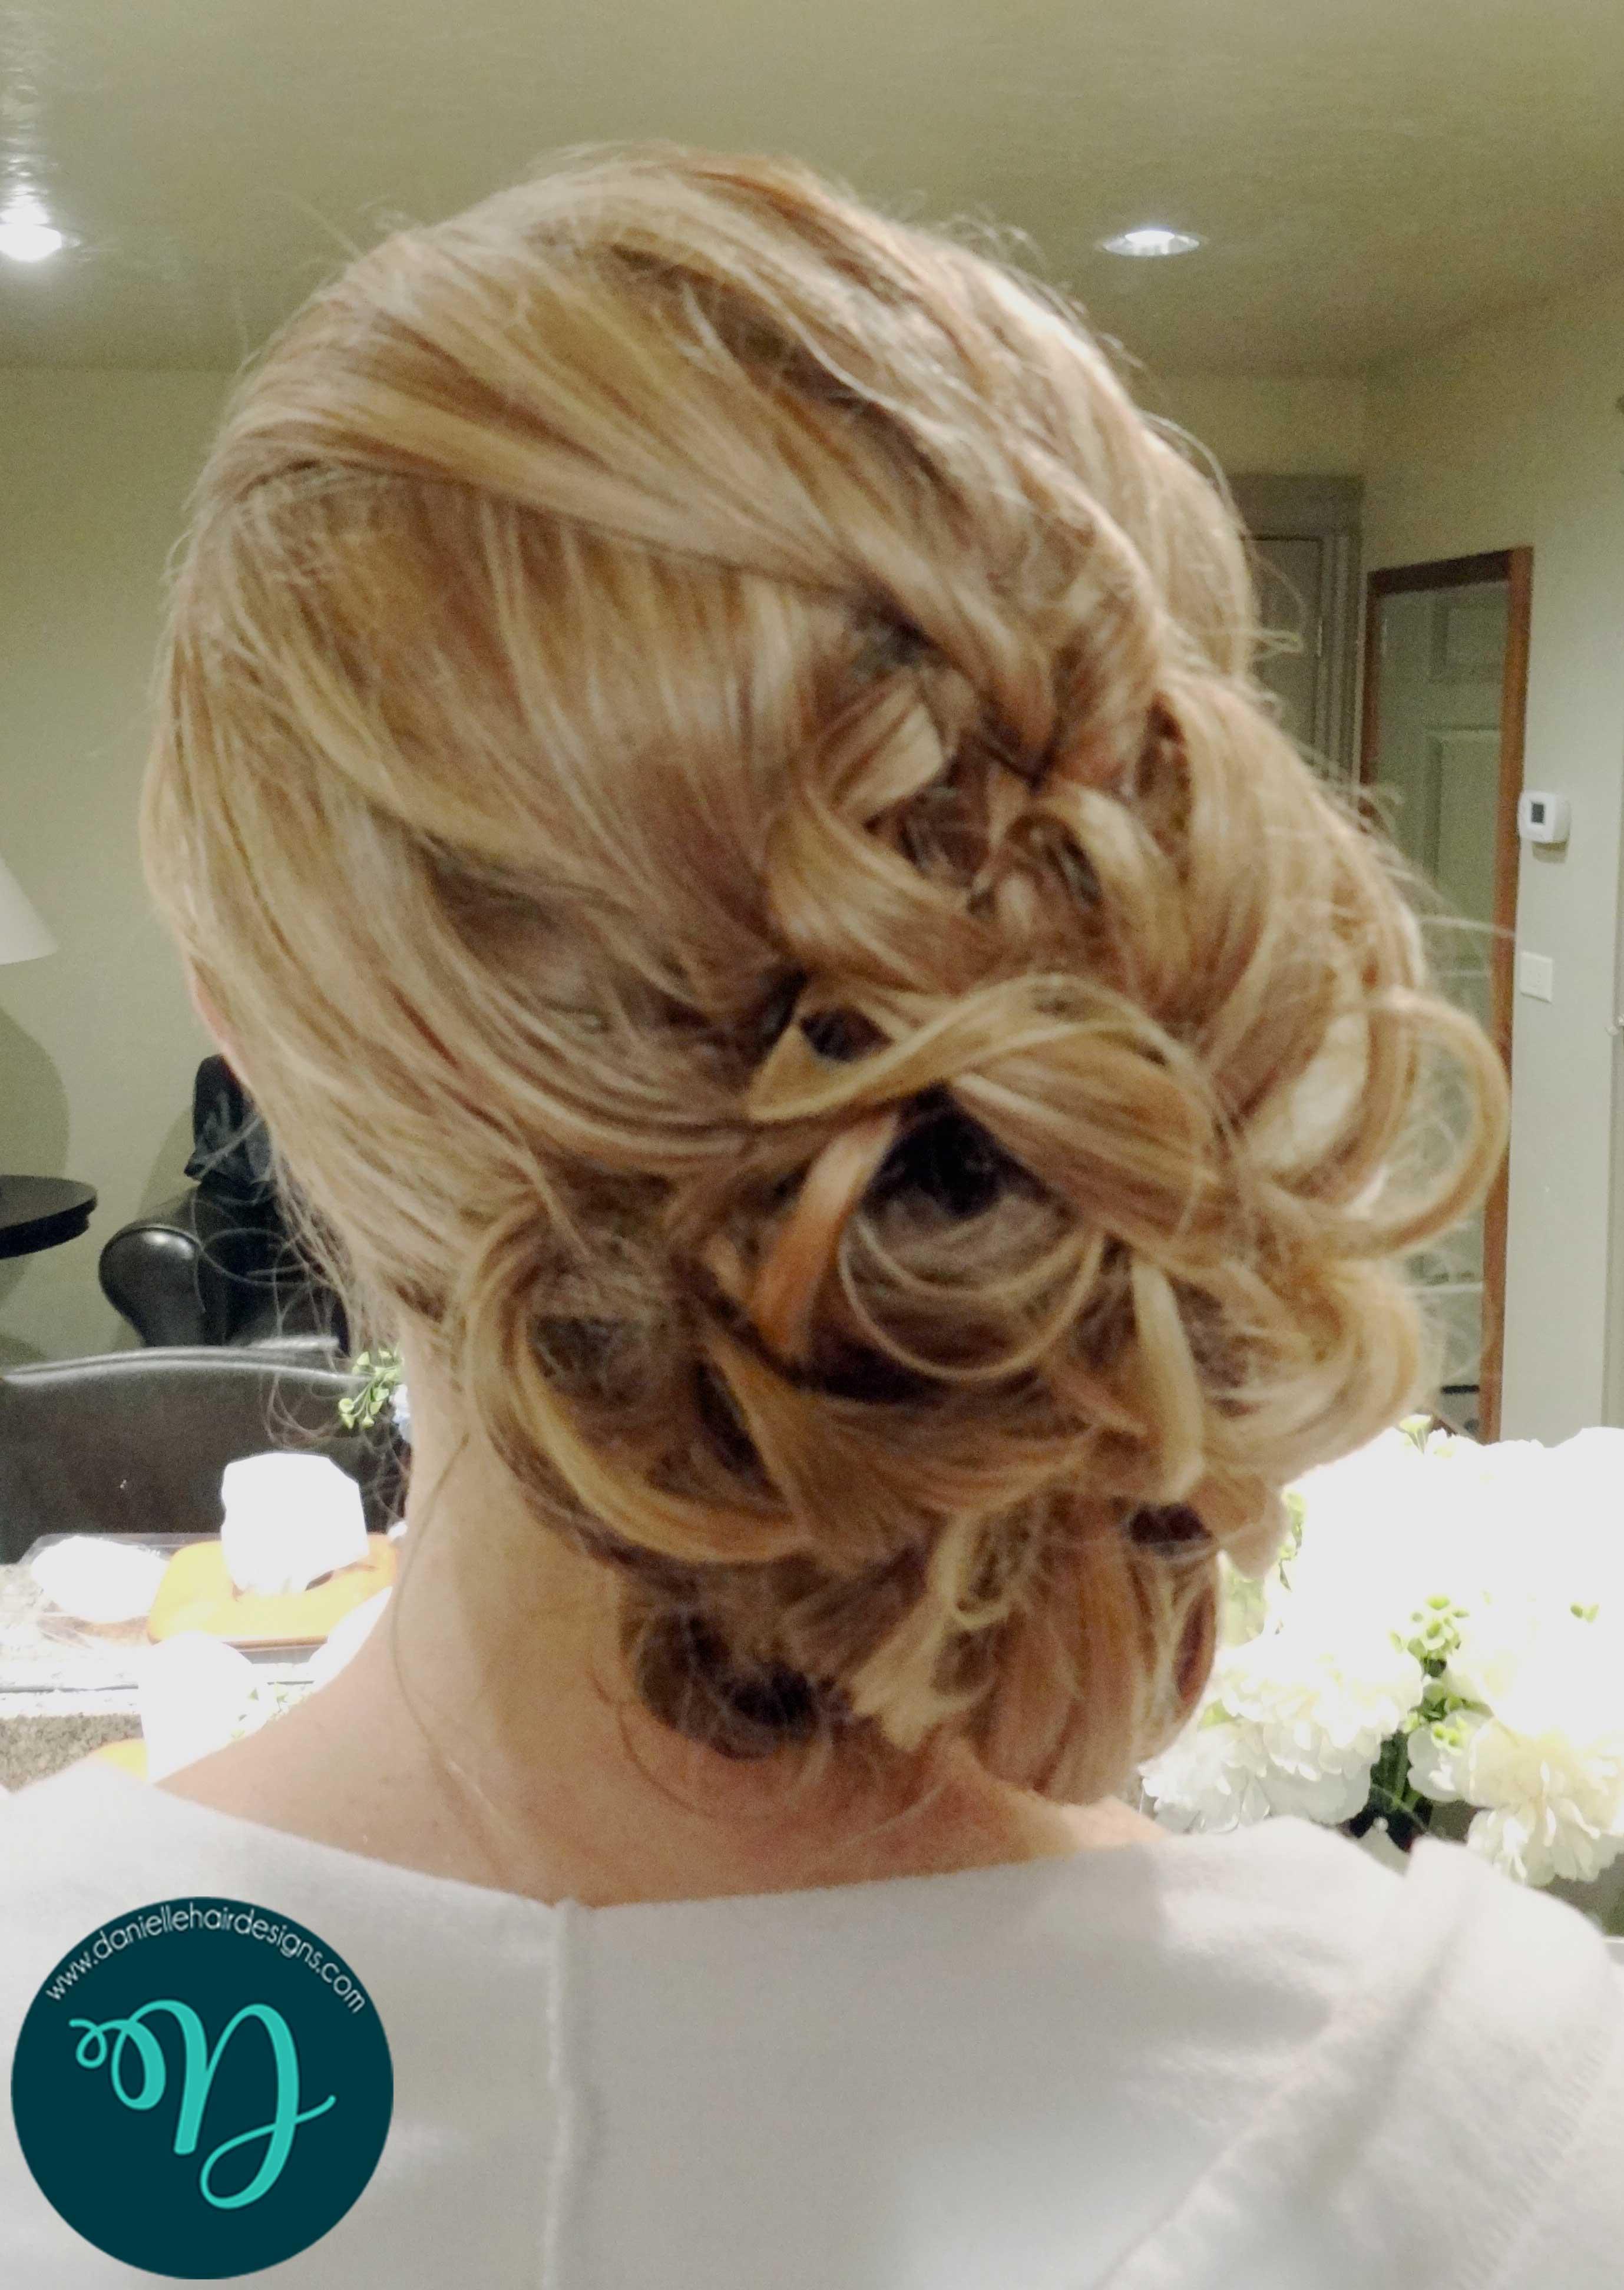 Hair Makeup Designs By Danielle Design Portfolio